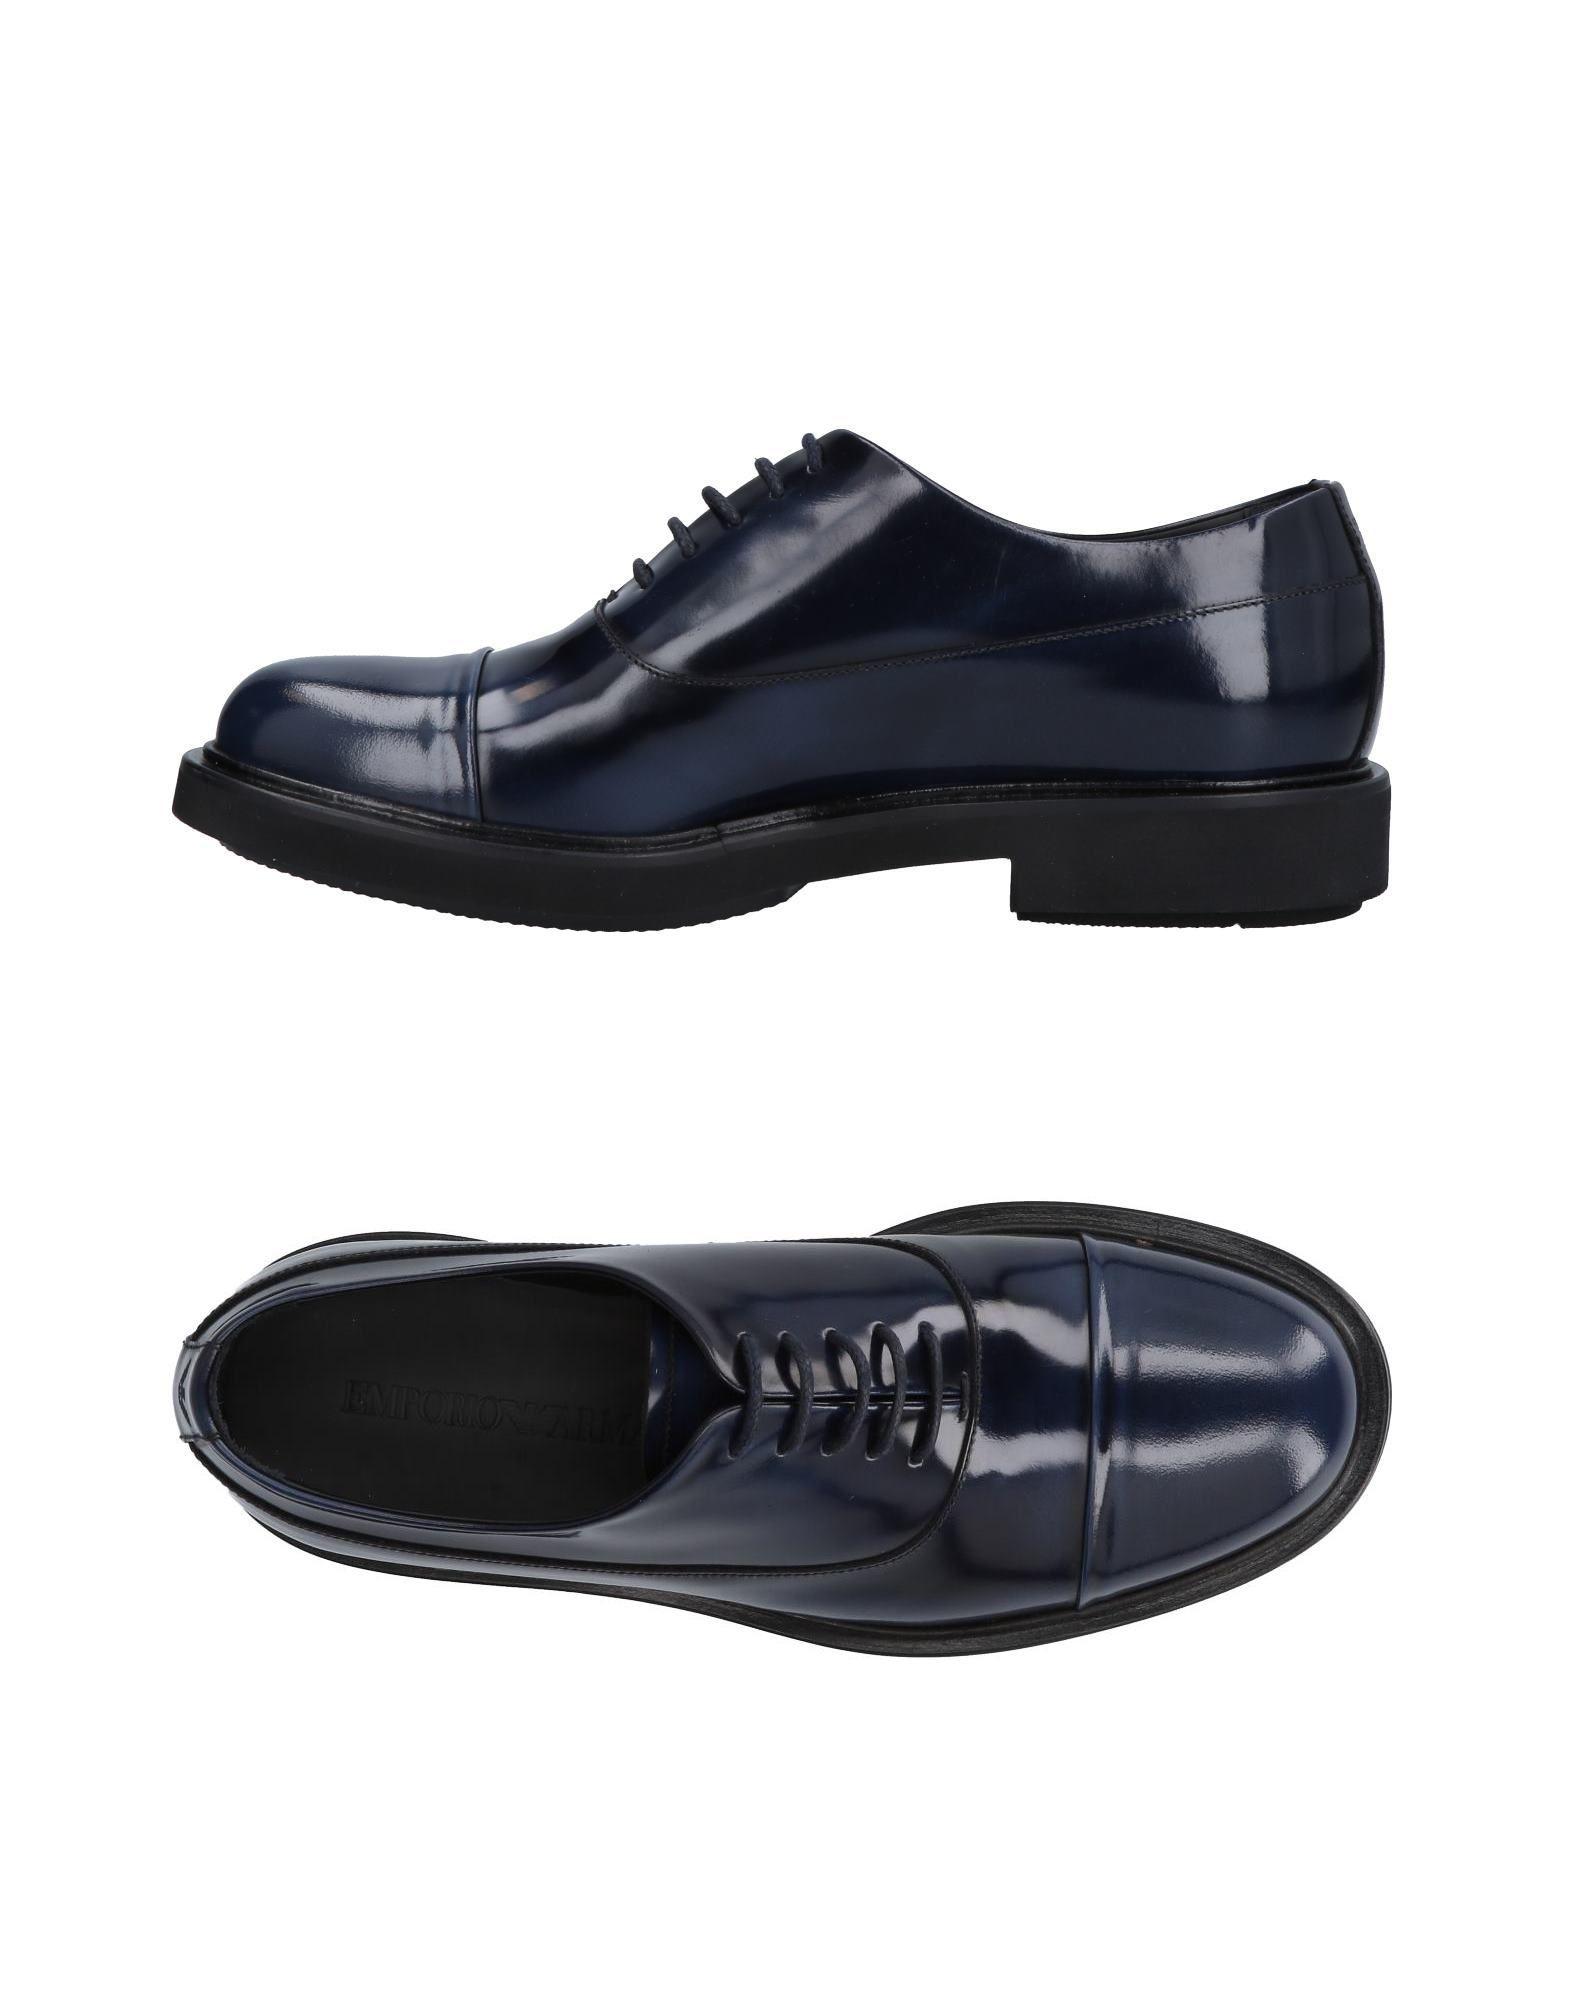 Emporio Armani Schnürschuhe Herren  11465482FO Gute Qualität beliebte beliebte beliebte Schuhe c8721c